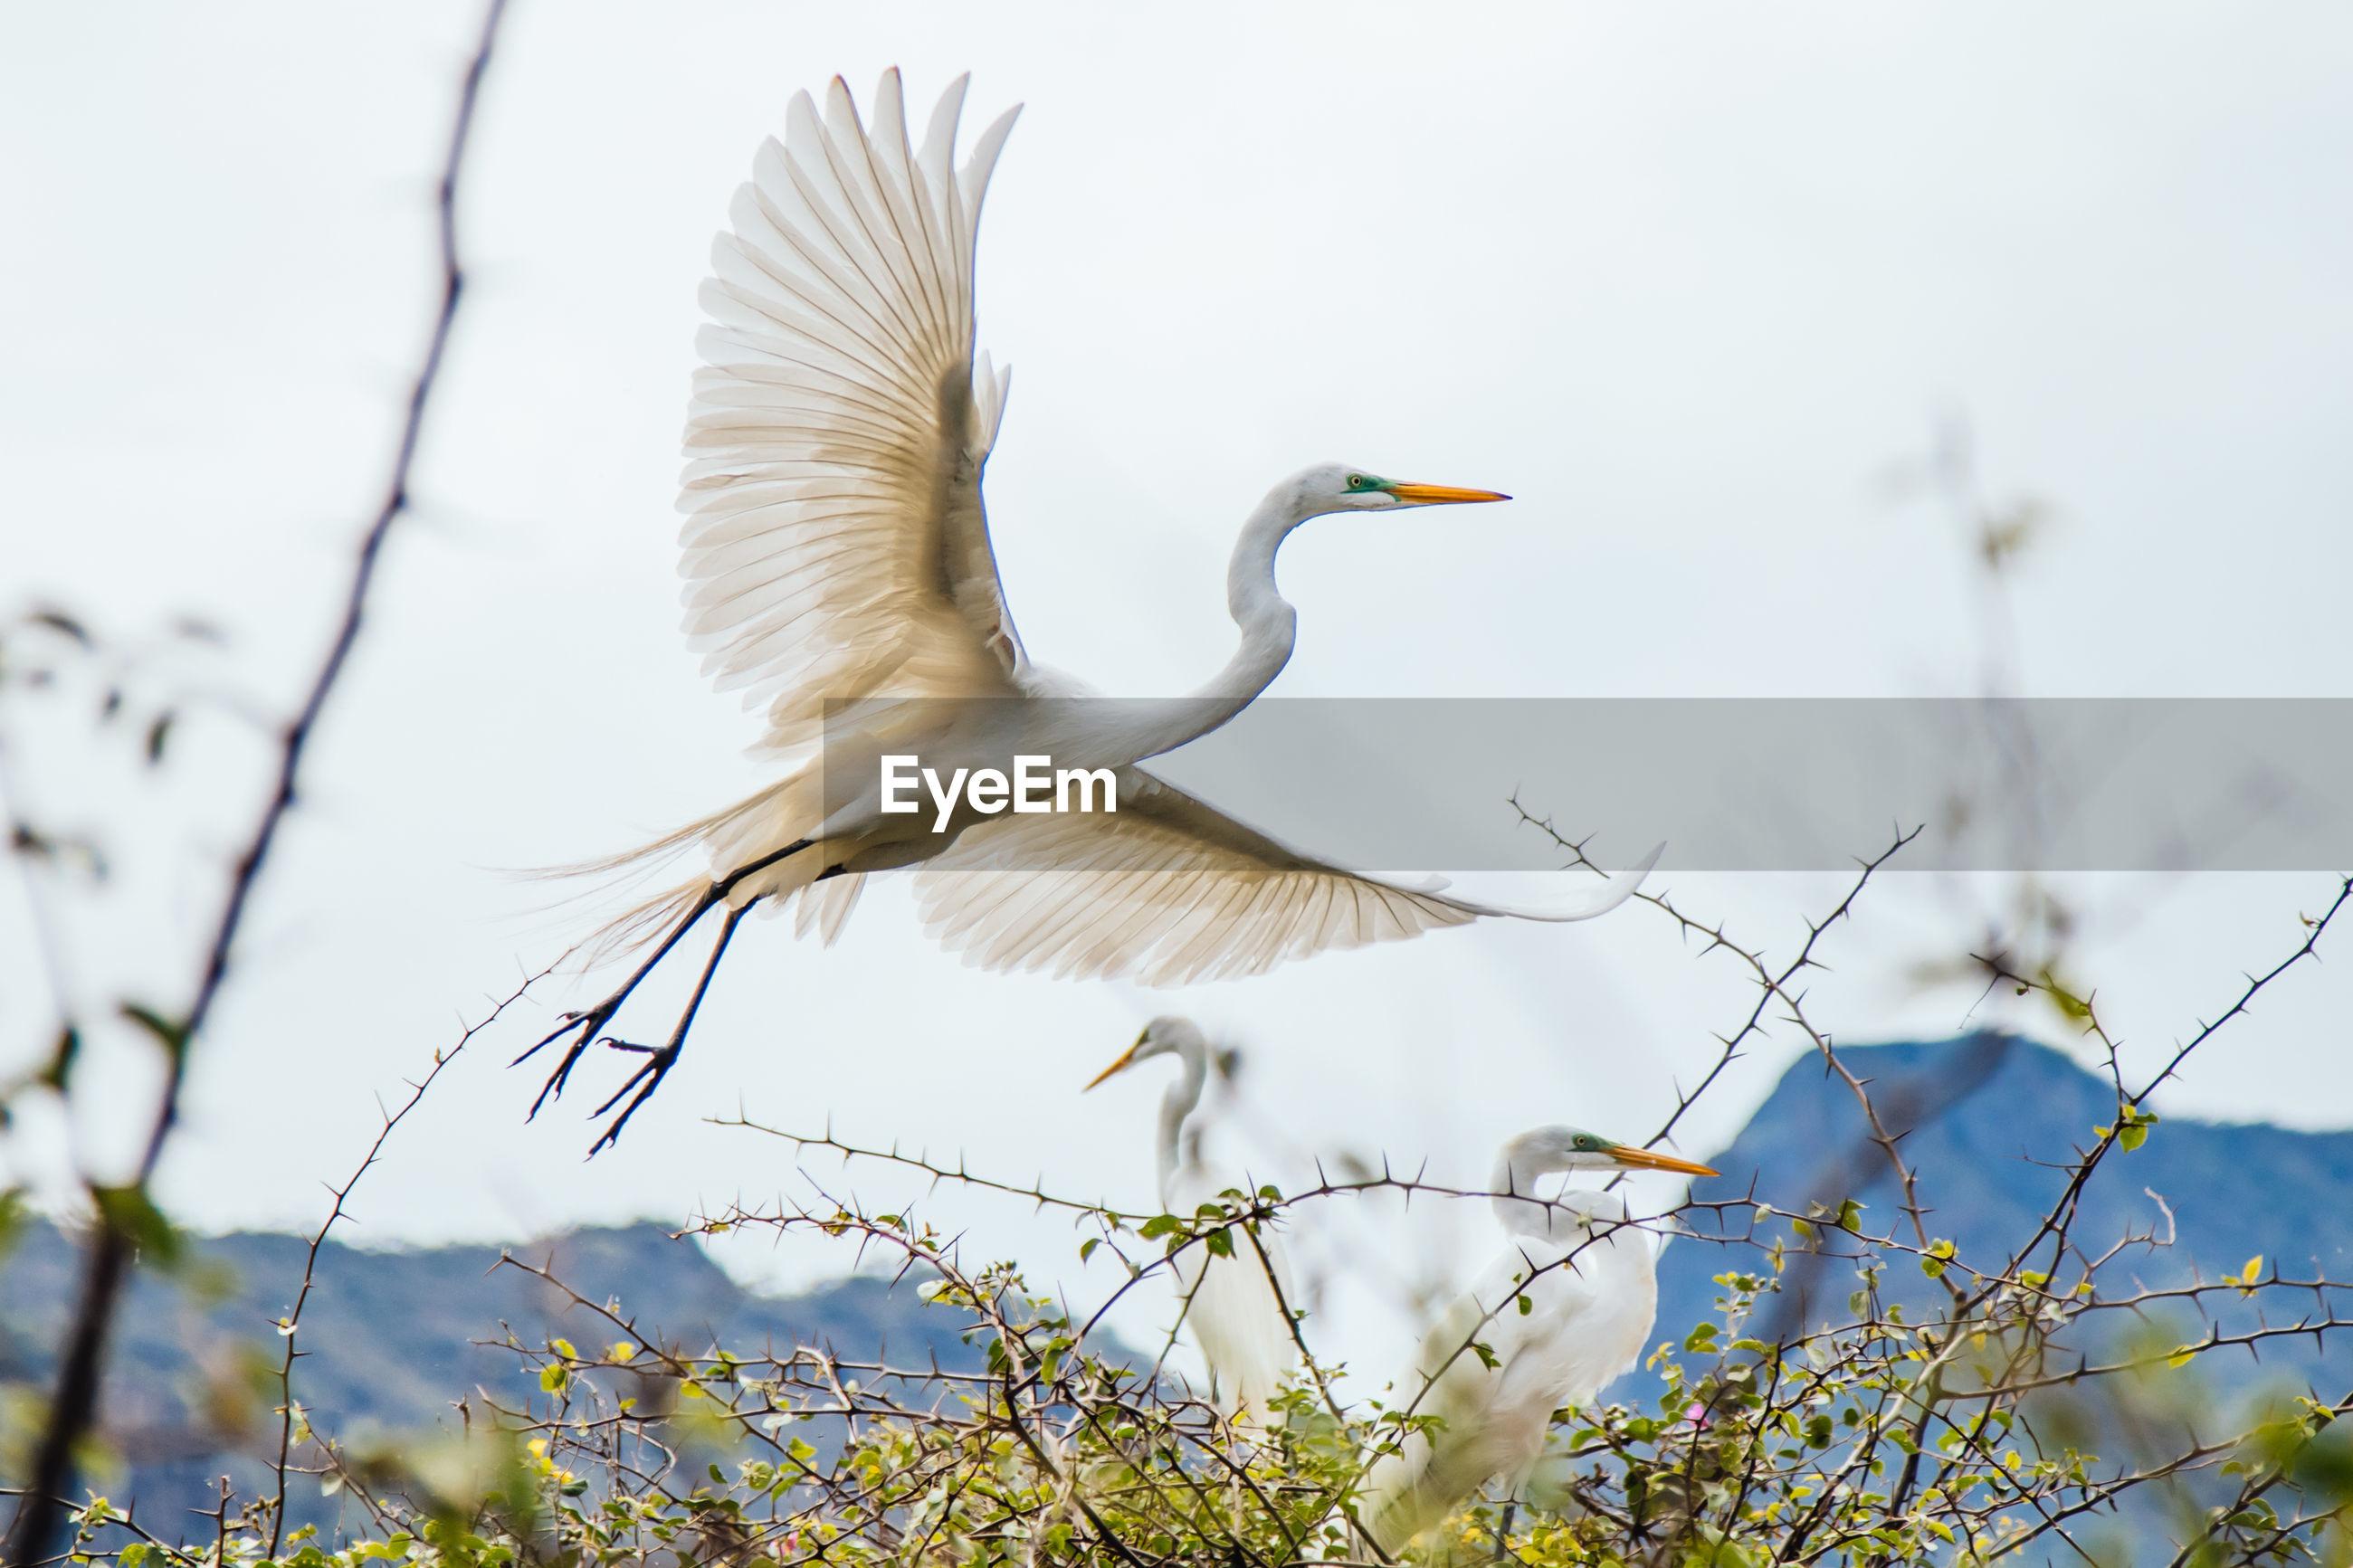 Great egrets flying over plants against sky